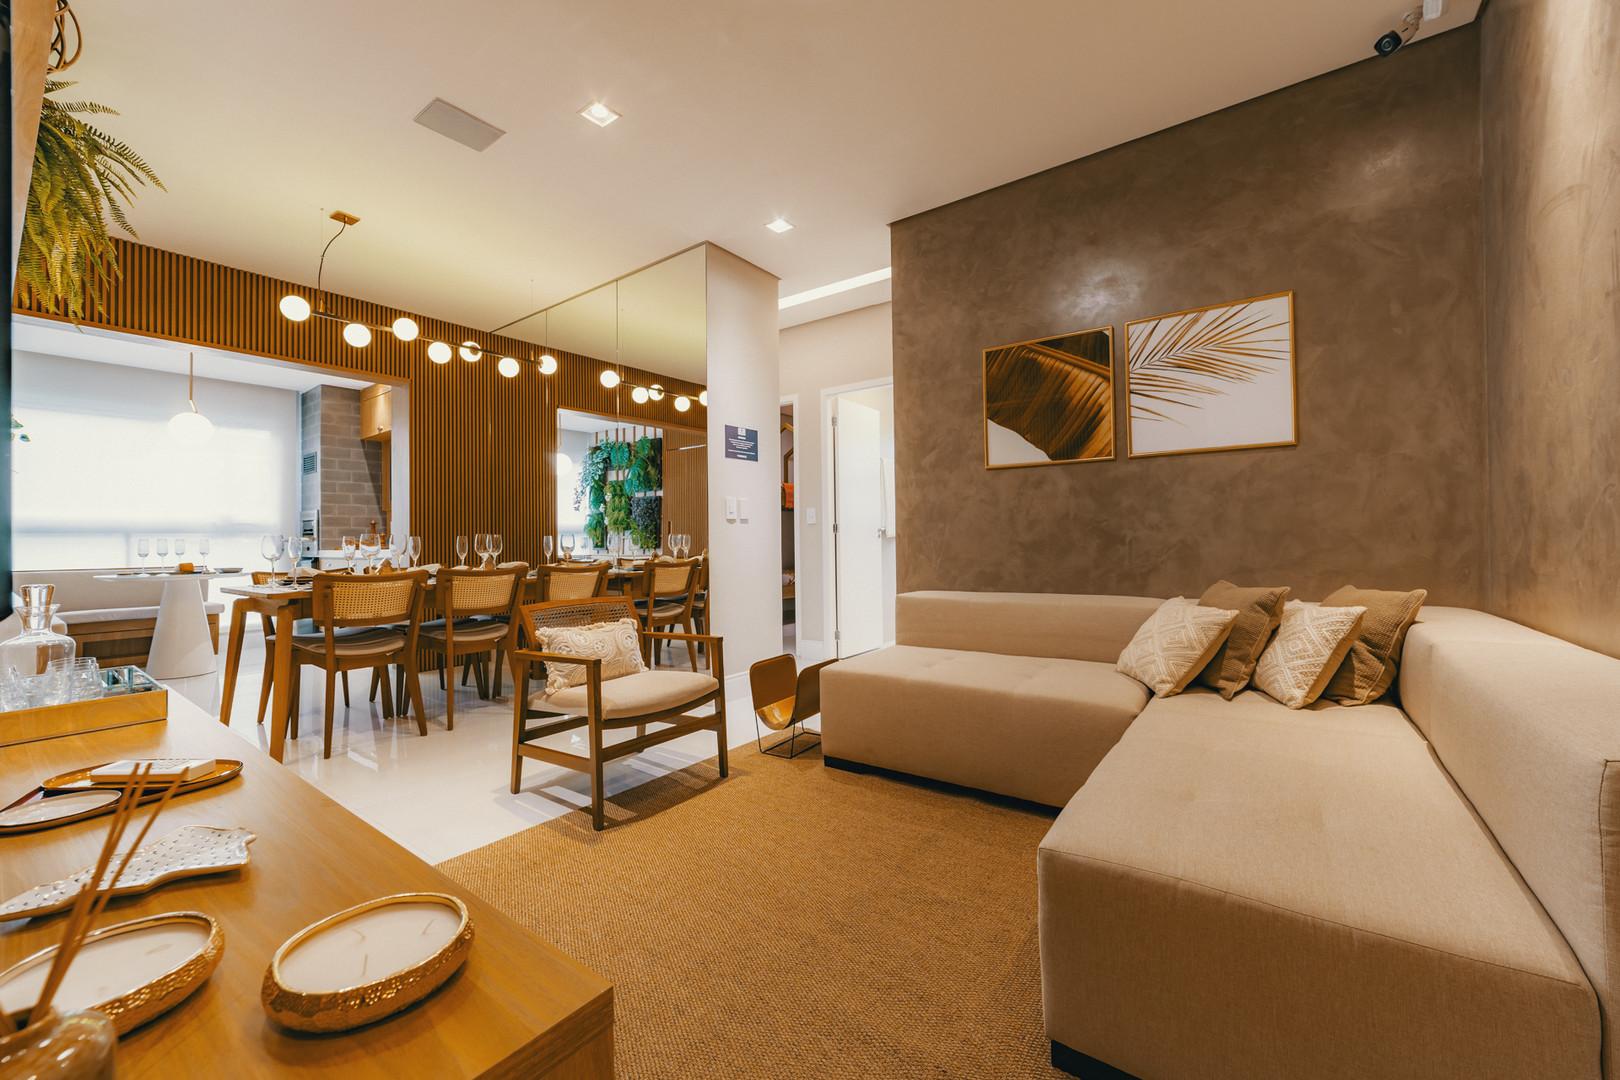 005 - Lupema - Terrace Residence - 08-01